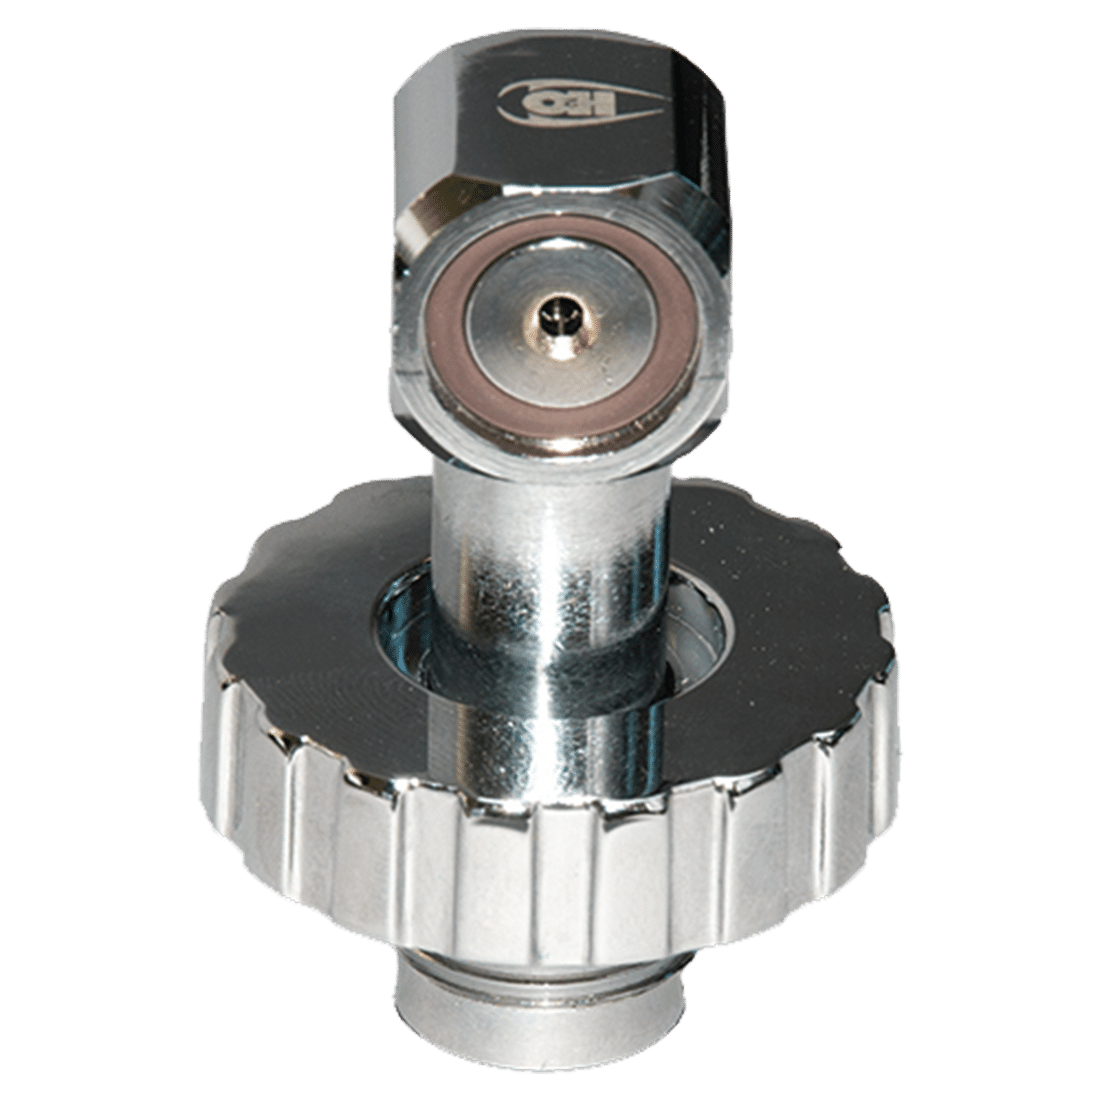 Diving Din To Yoke Cylinder Tank Filling Connector Regulator Adapter